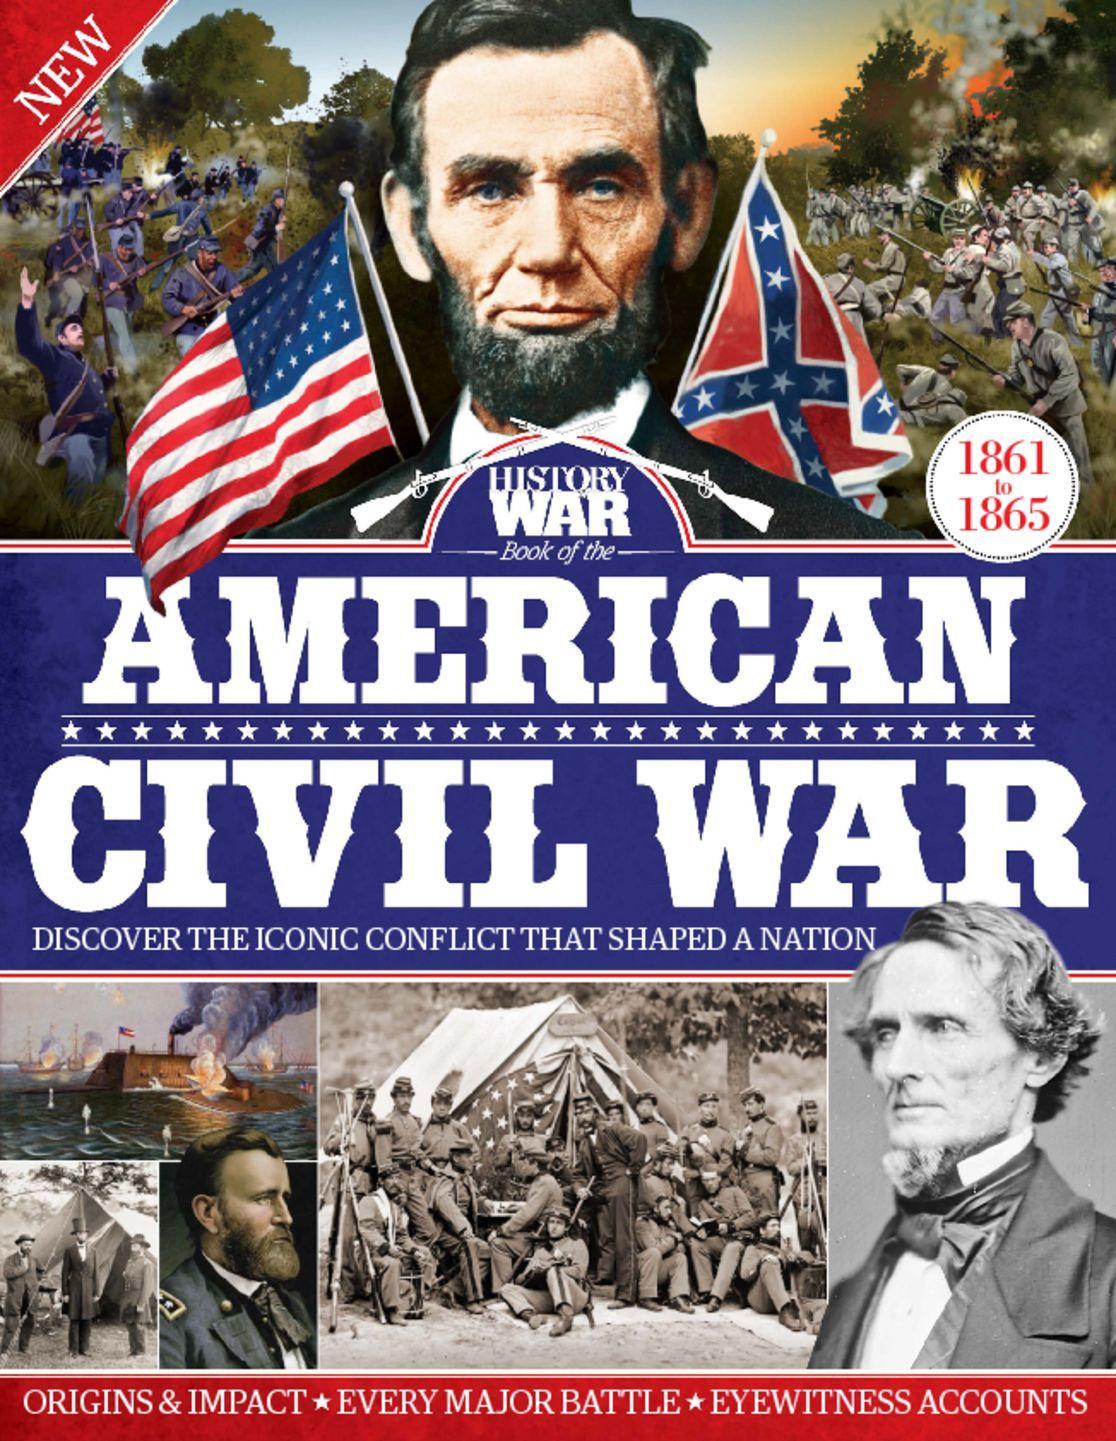 History Of War Book Of The American Civil War Magazine